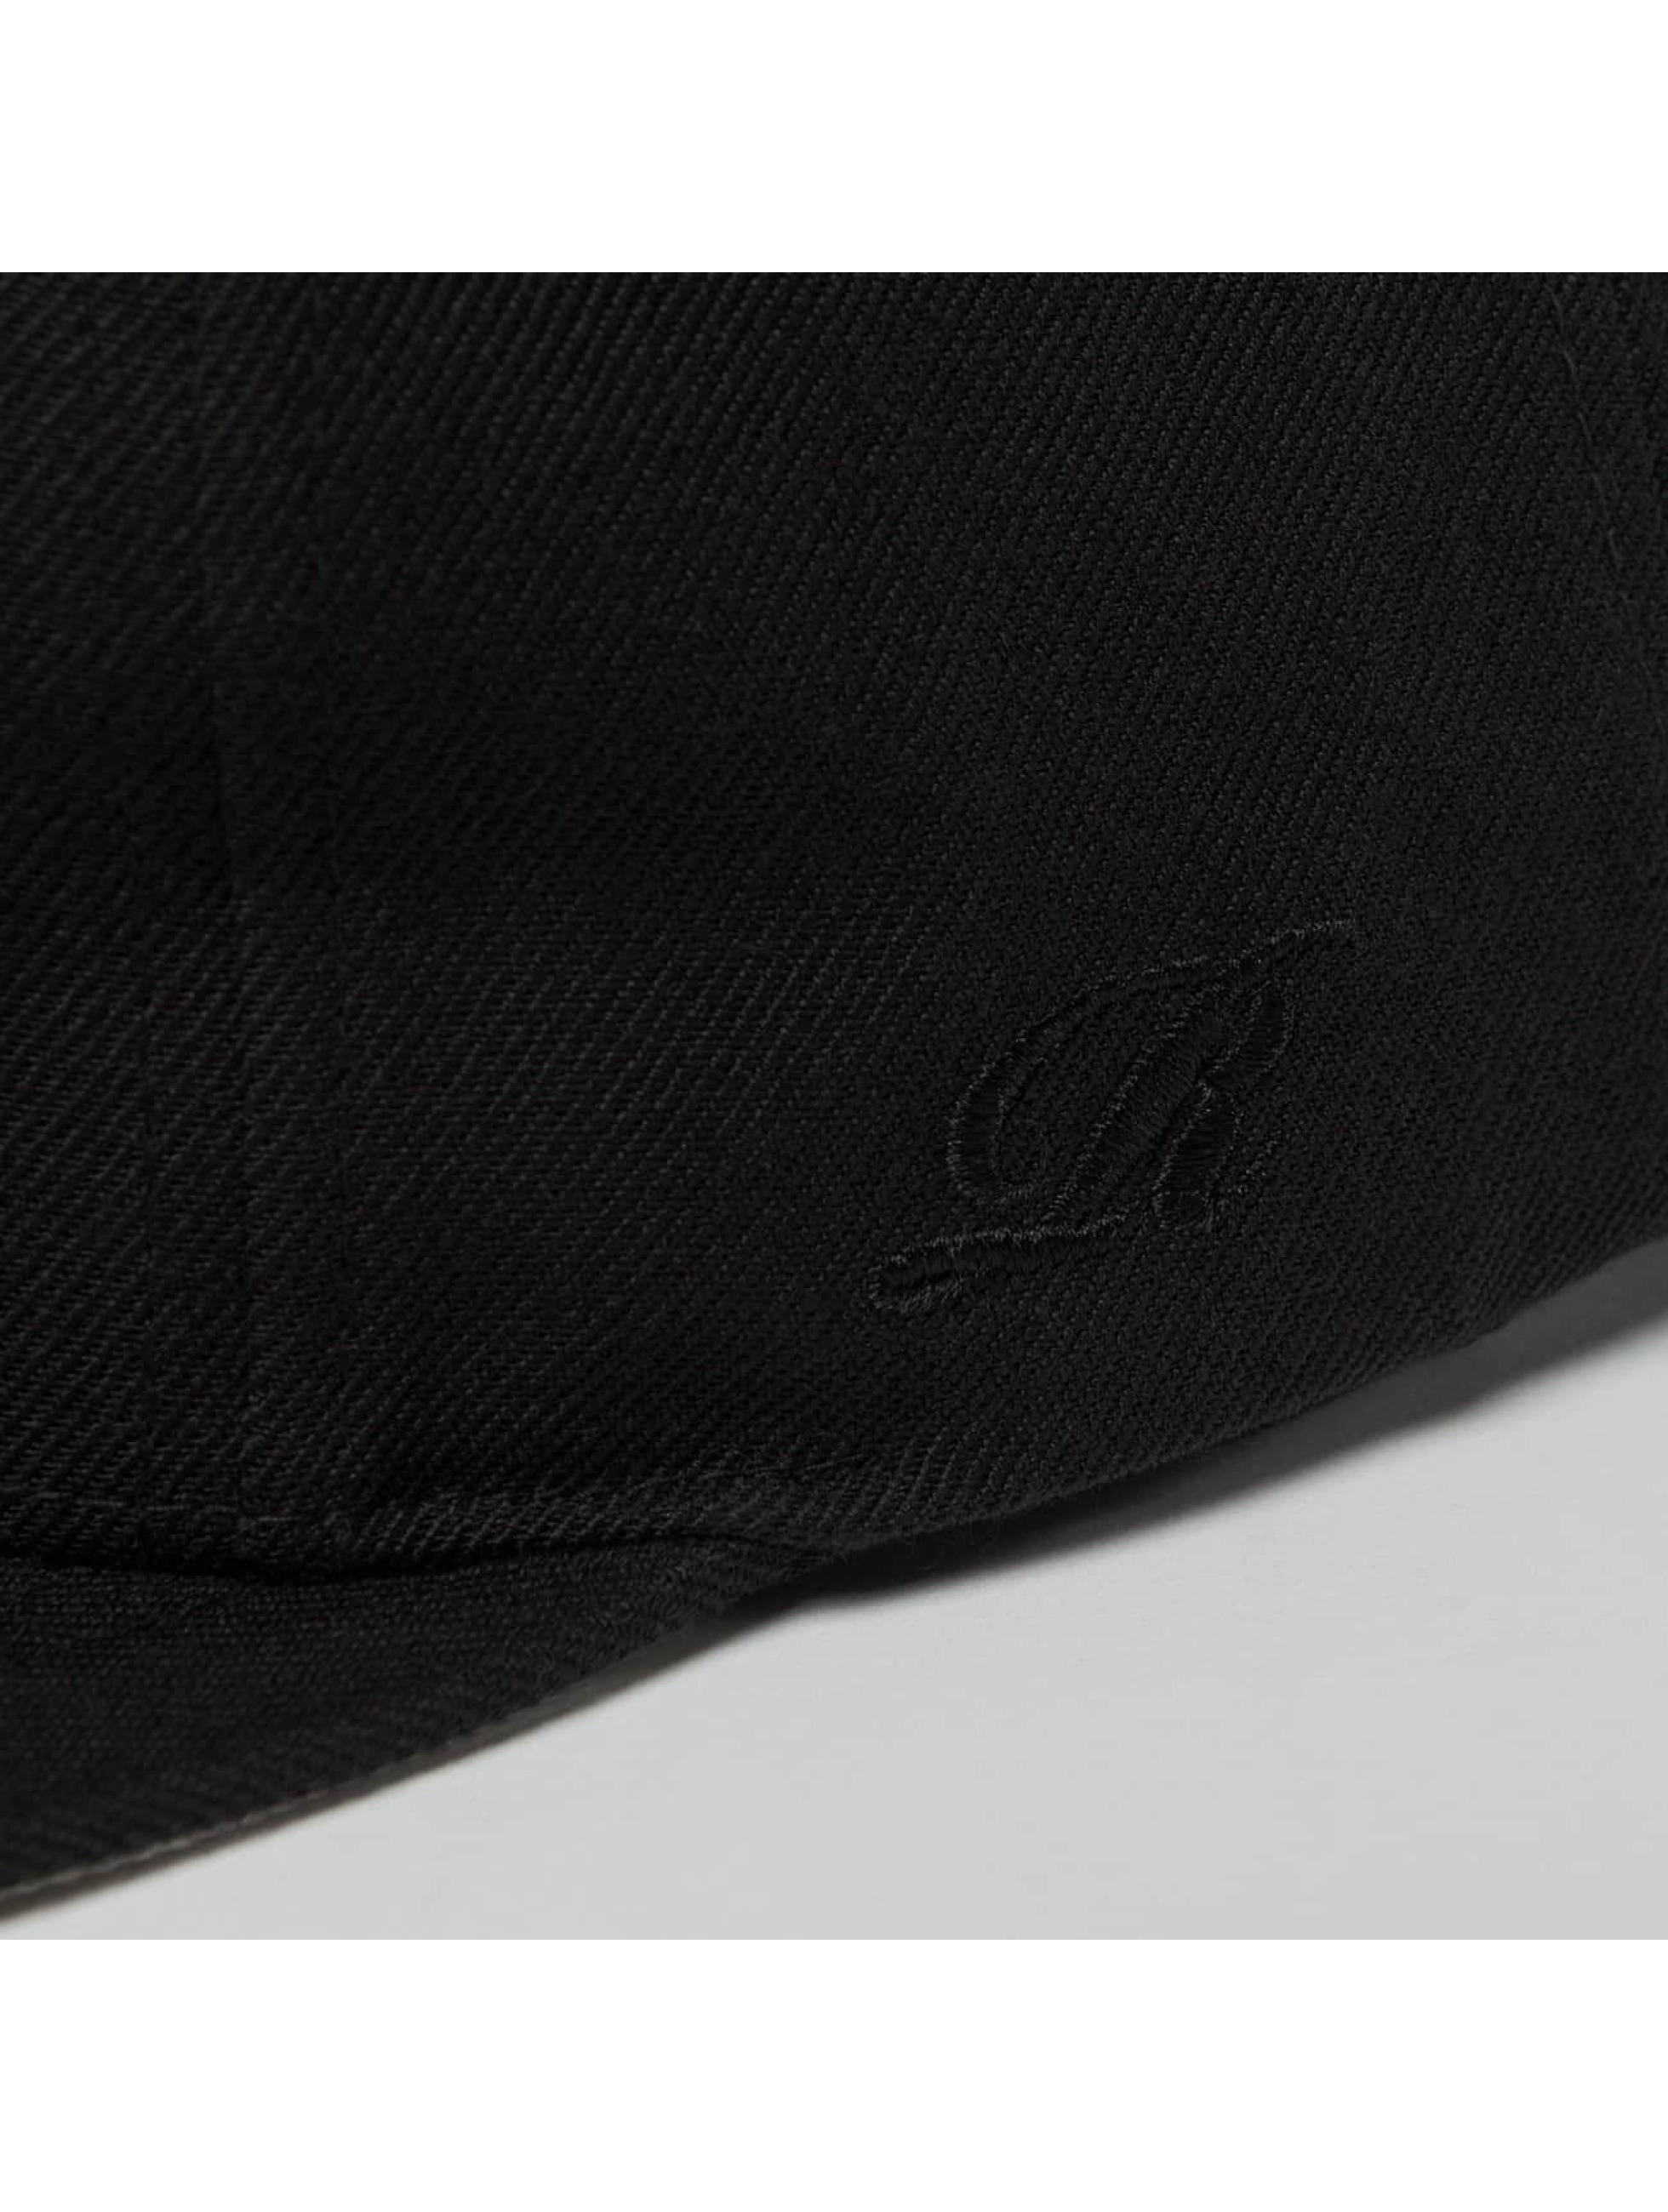 Reell Jeans Кепка с застёжкой Base черный